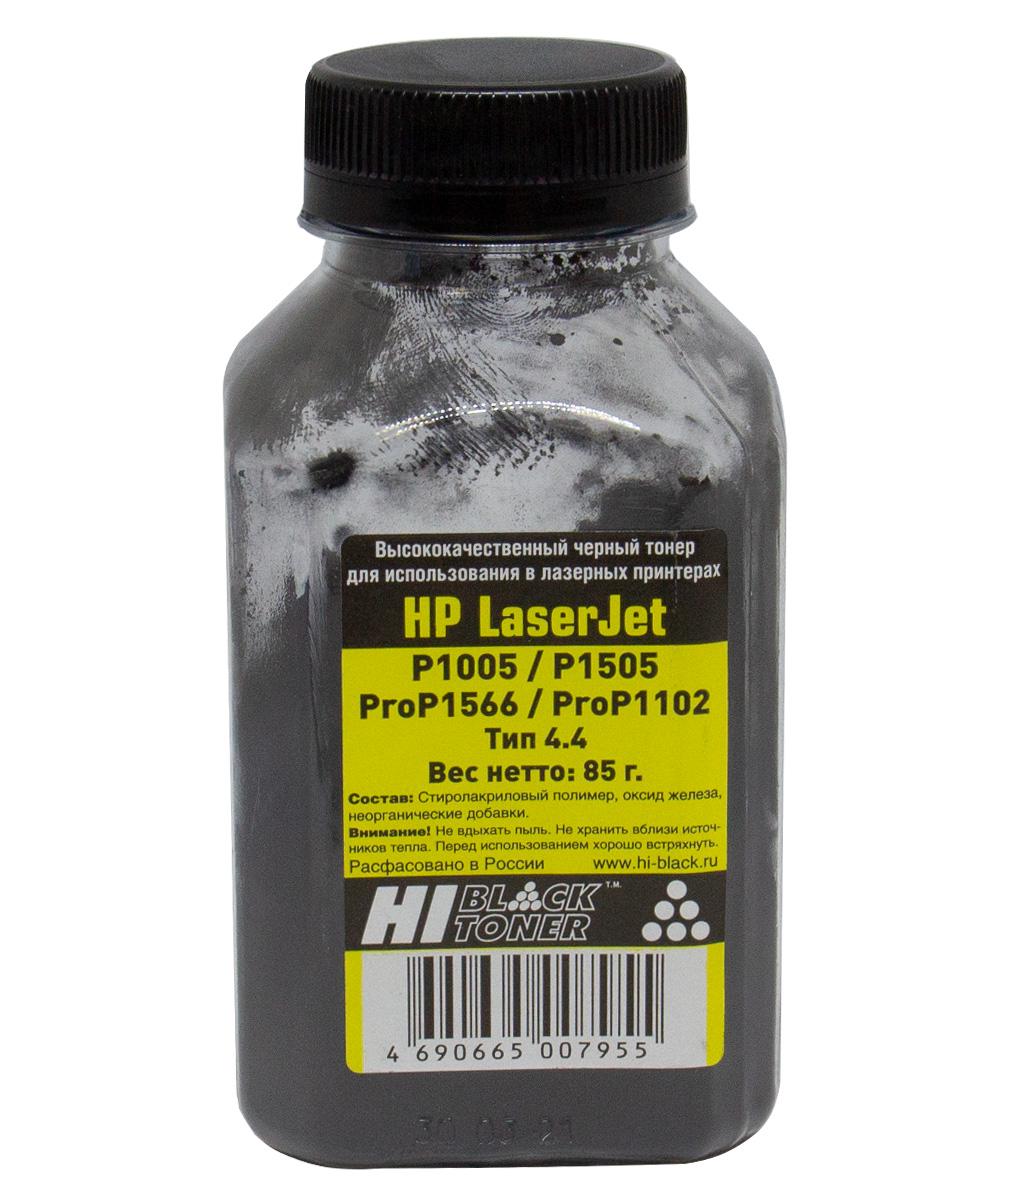 Тонер Hi-Black для HP LJ P1005/P1505/ProP1566/ProP1102, Тип 4.4, Bk, 85 г, банка